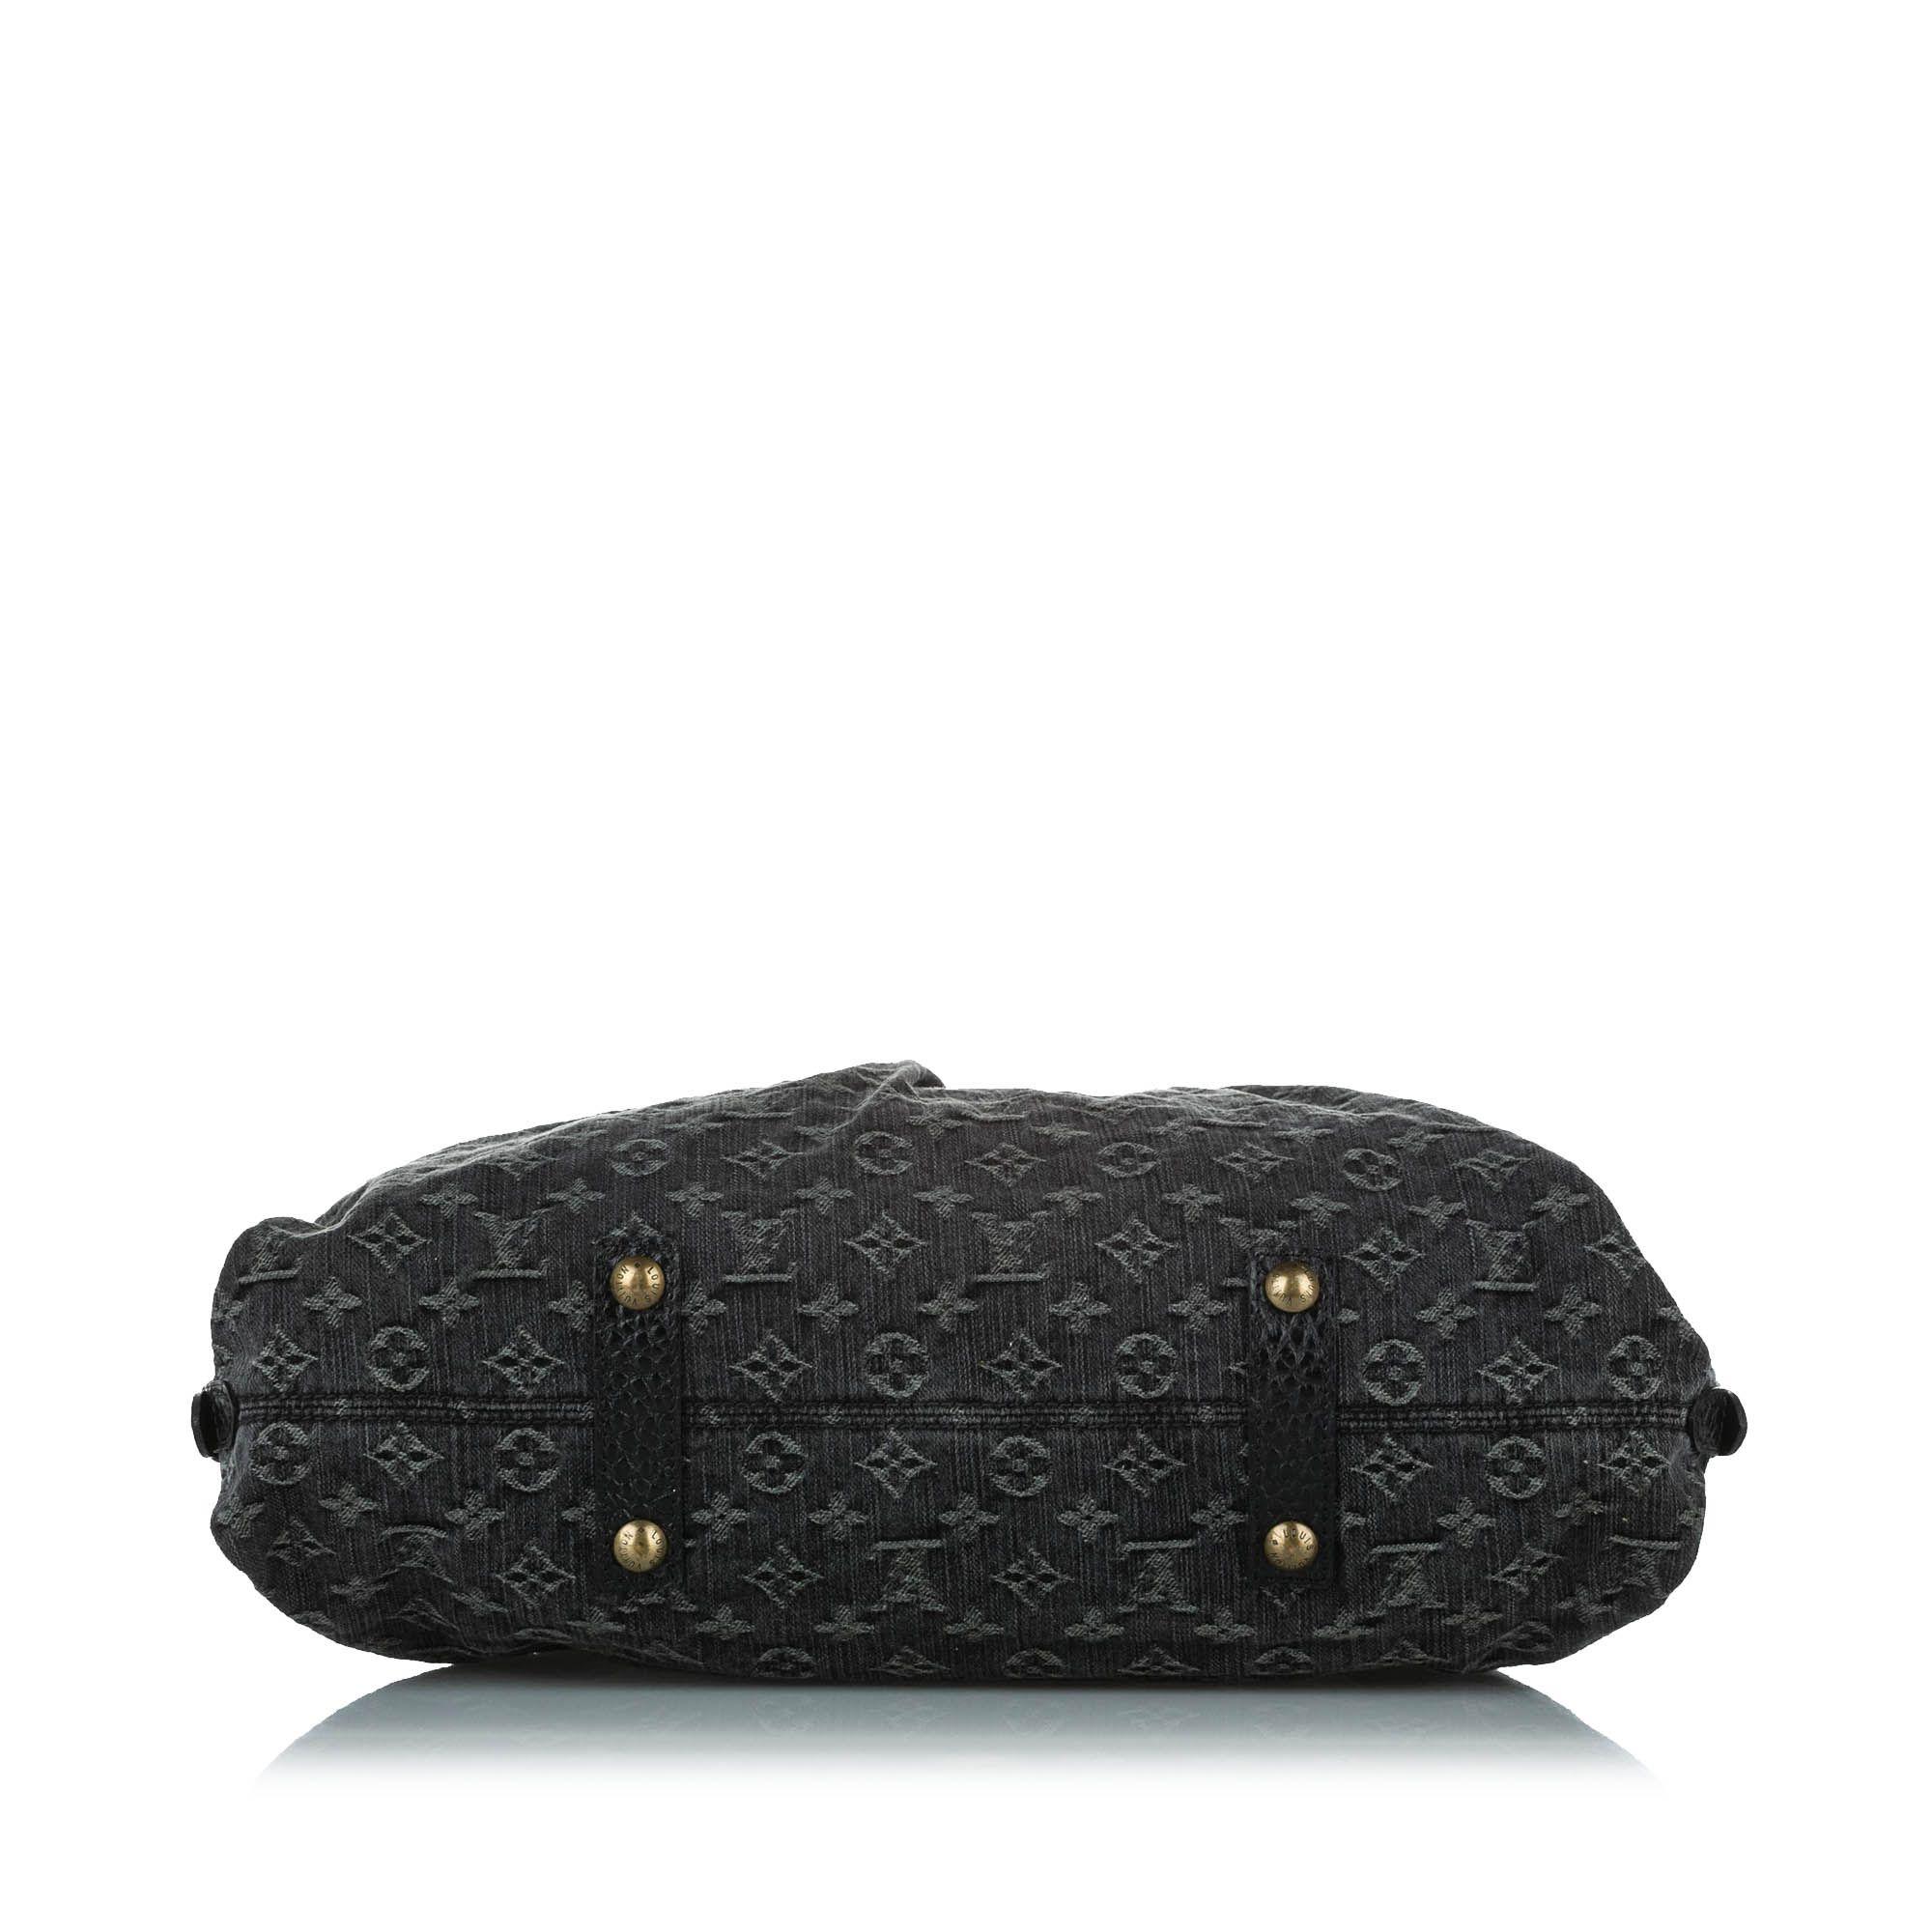 Vintage Louis Vuitton Monogram Denim Neo Cabby GM Black